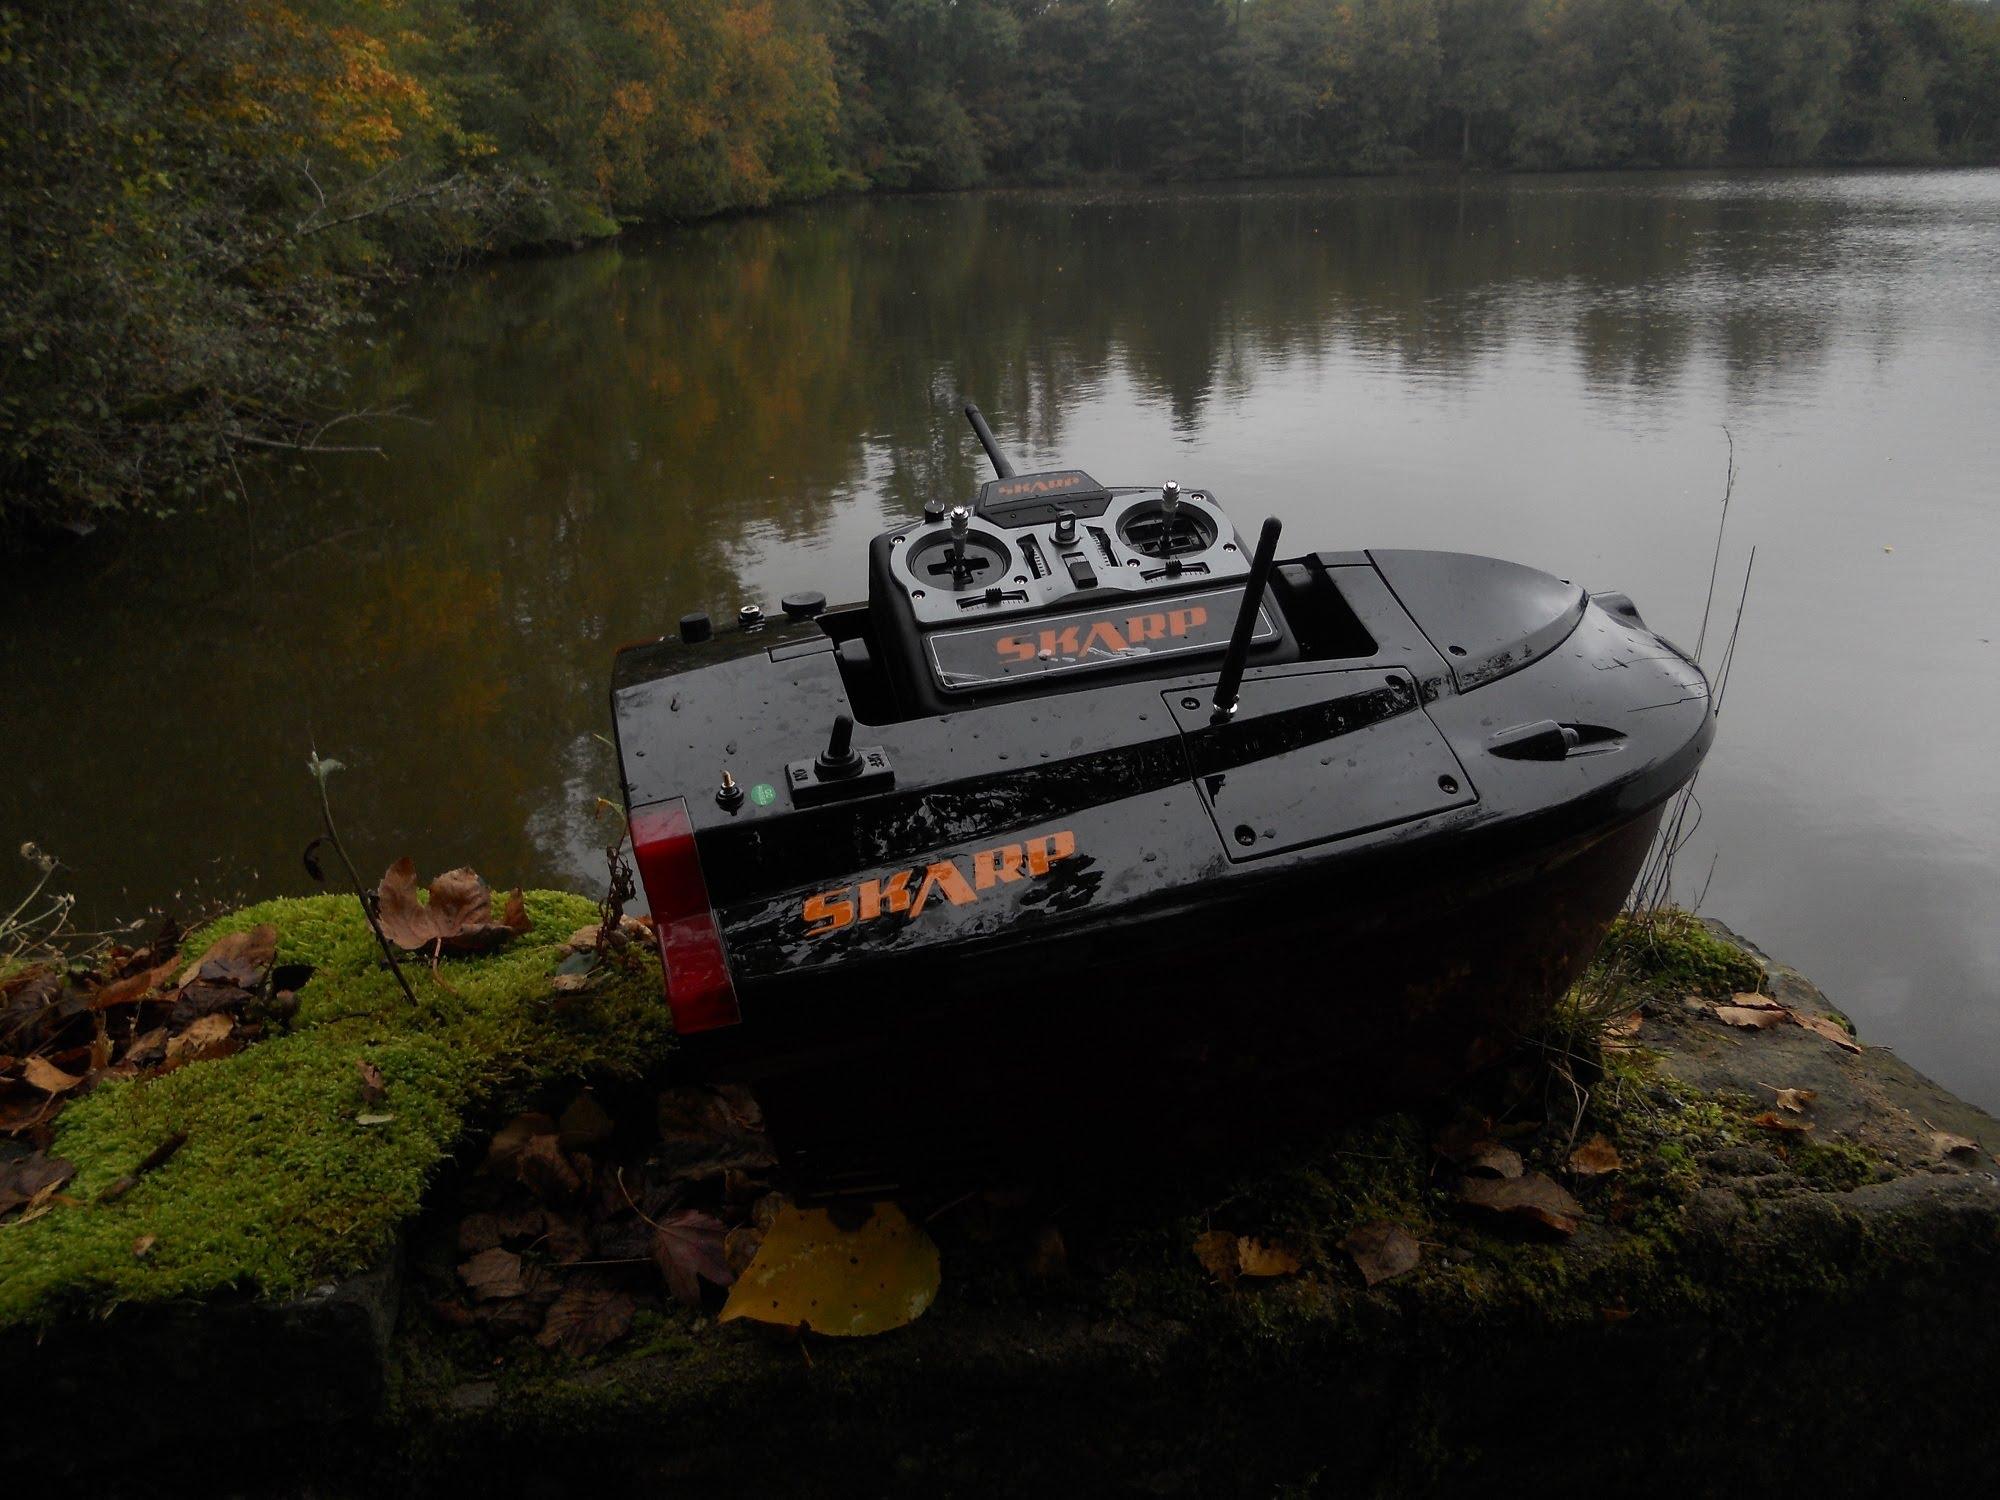 bateau amorceur skarp new s60